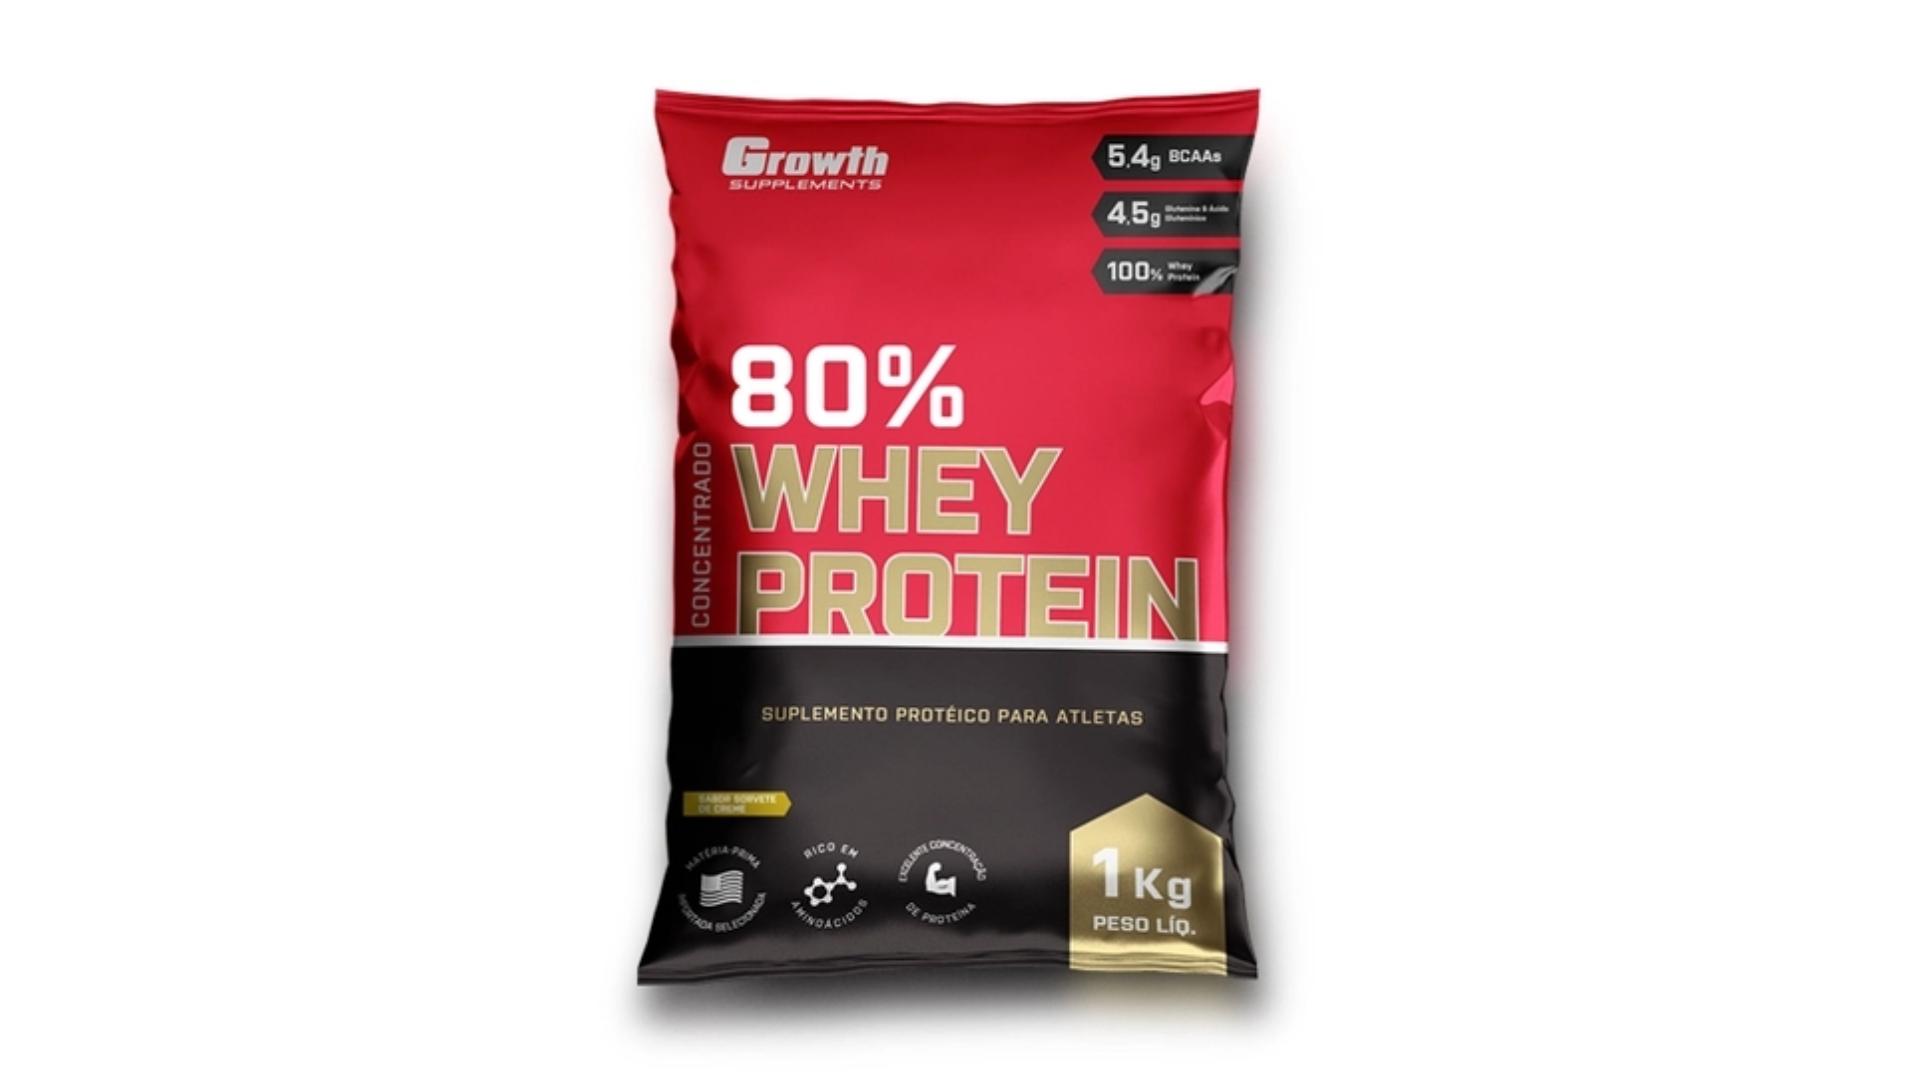 Whey Protein Growth Supplements (Imagem: Divulgação/Growth Supplements)